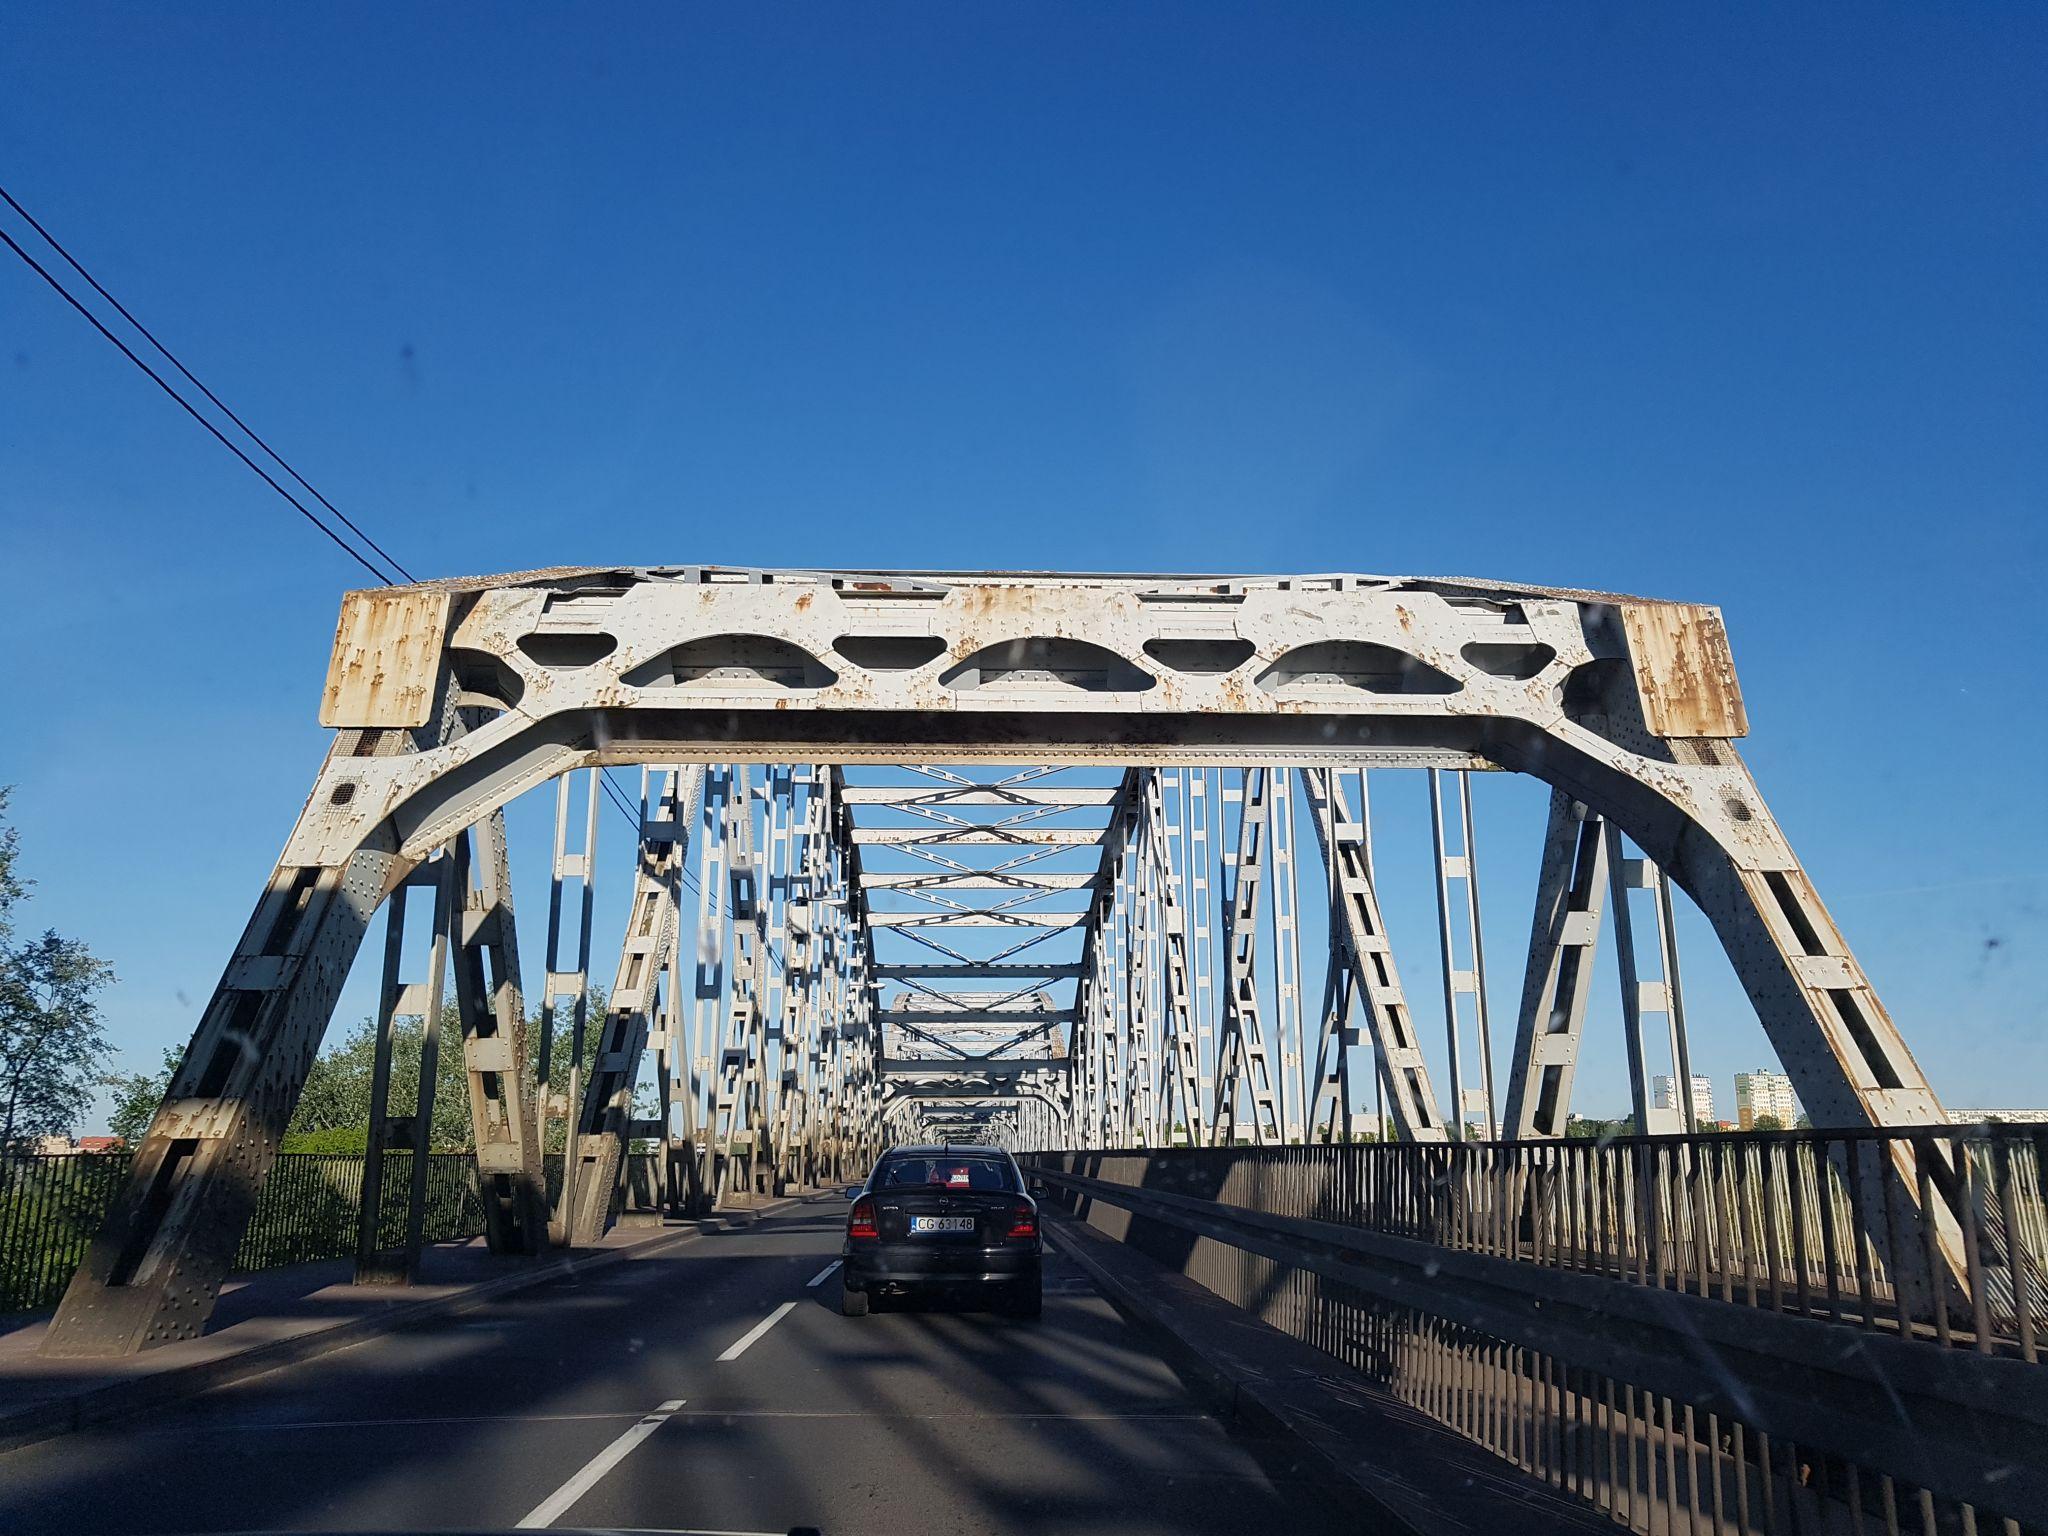 Old Bridge, Poland